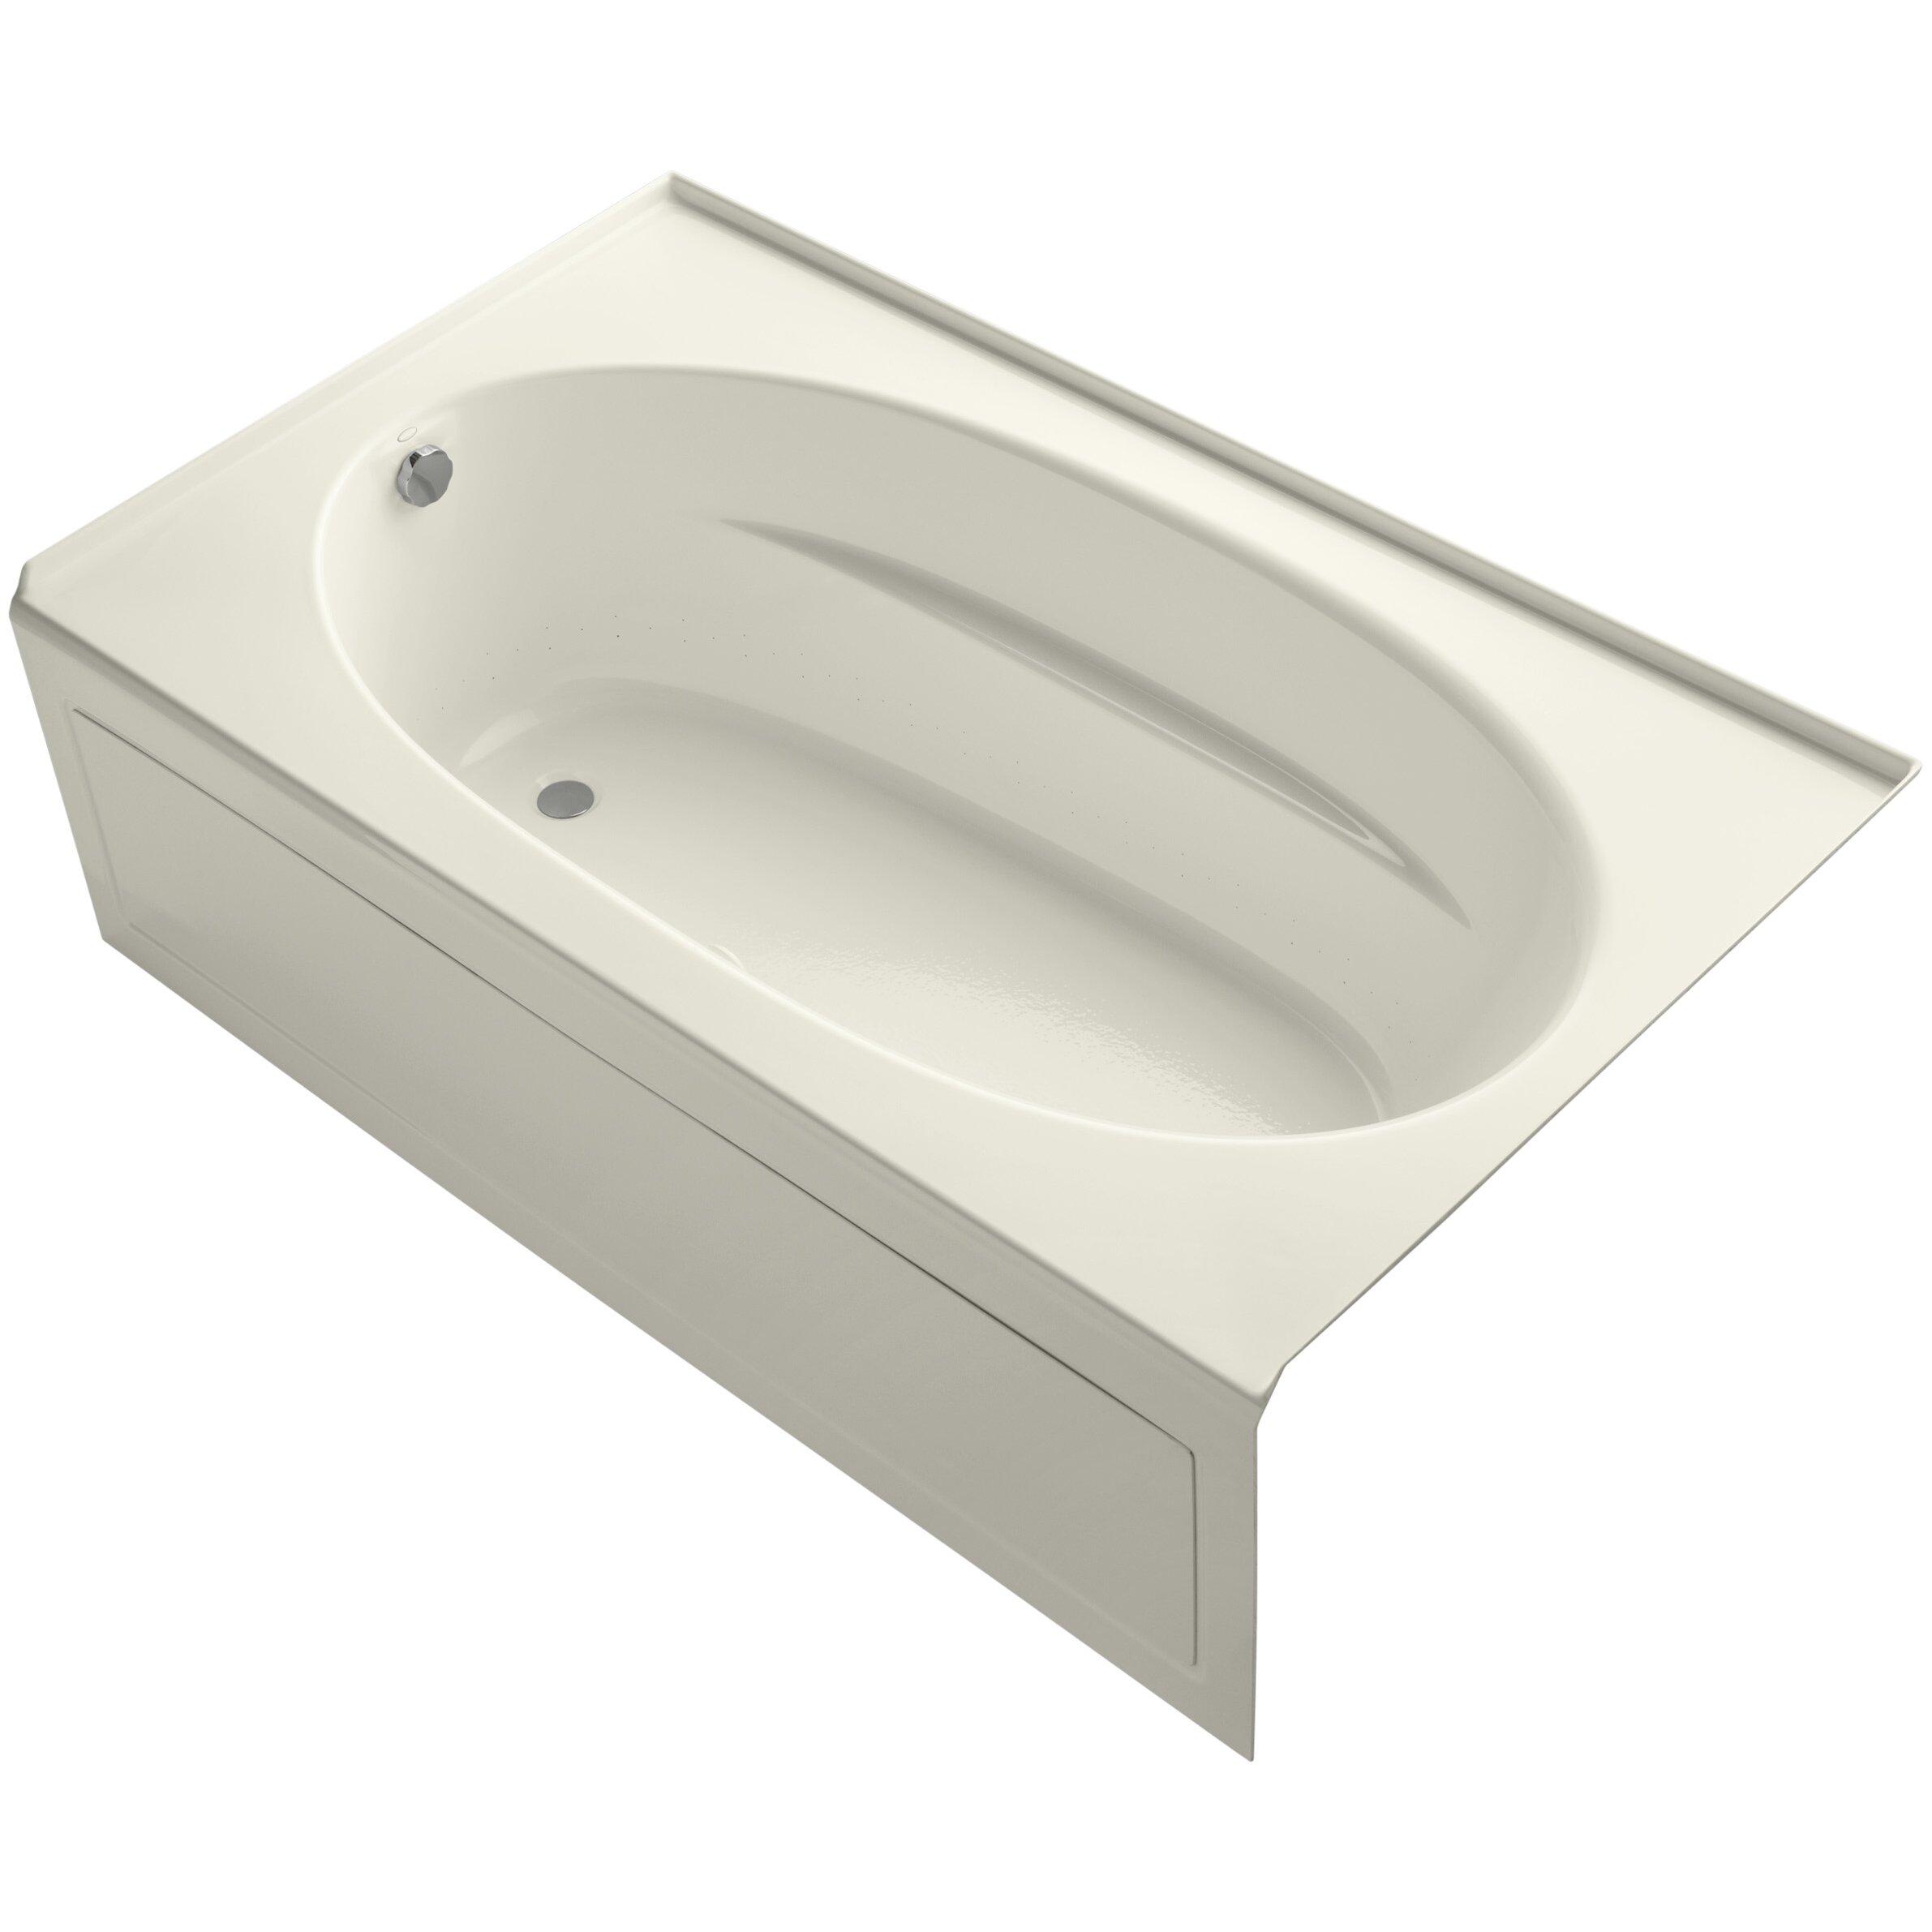 Bathtub Kohler : Home Improvement Bathroom Fixtures ... Kohler Part #: K-1114-GLA SKU ...